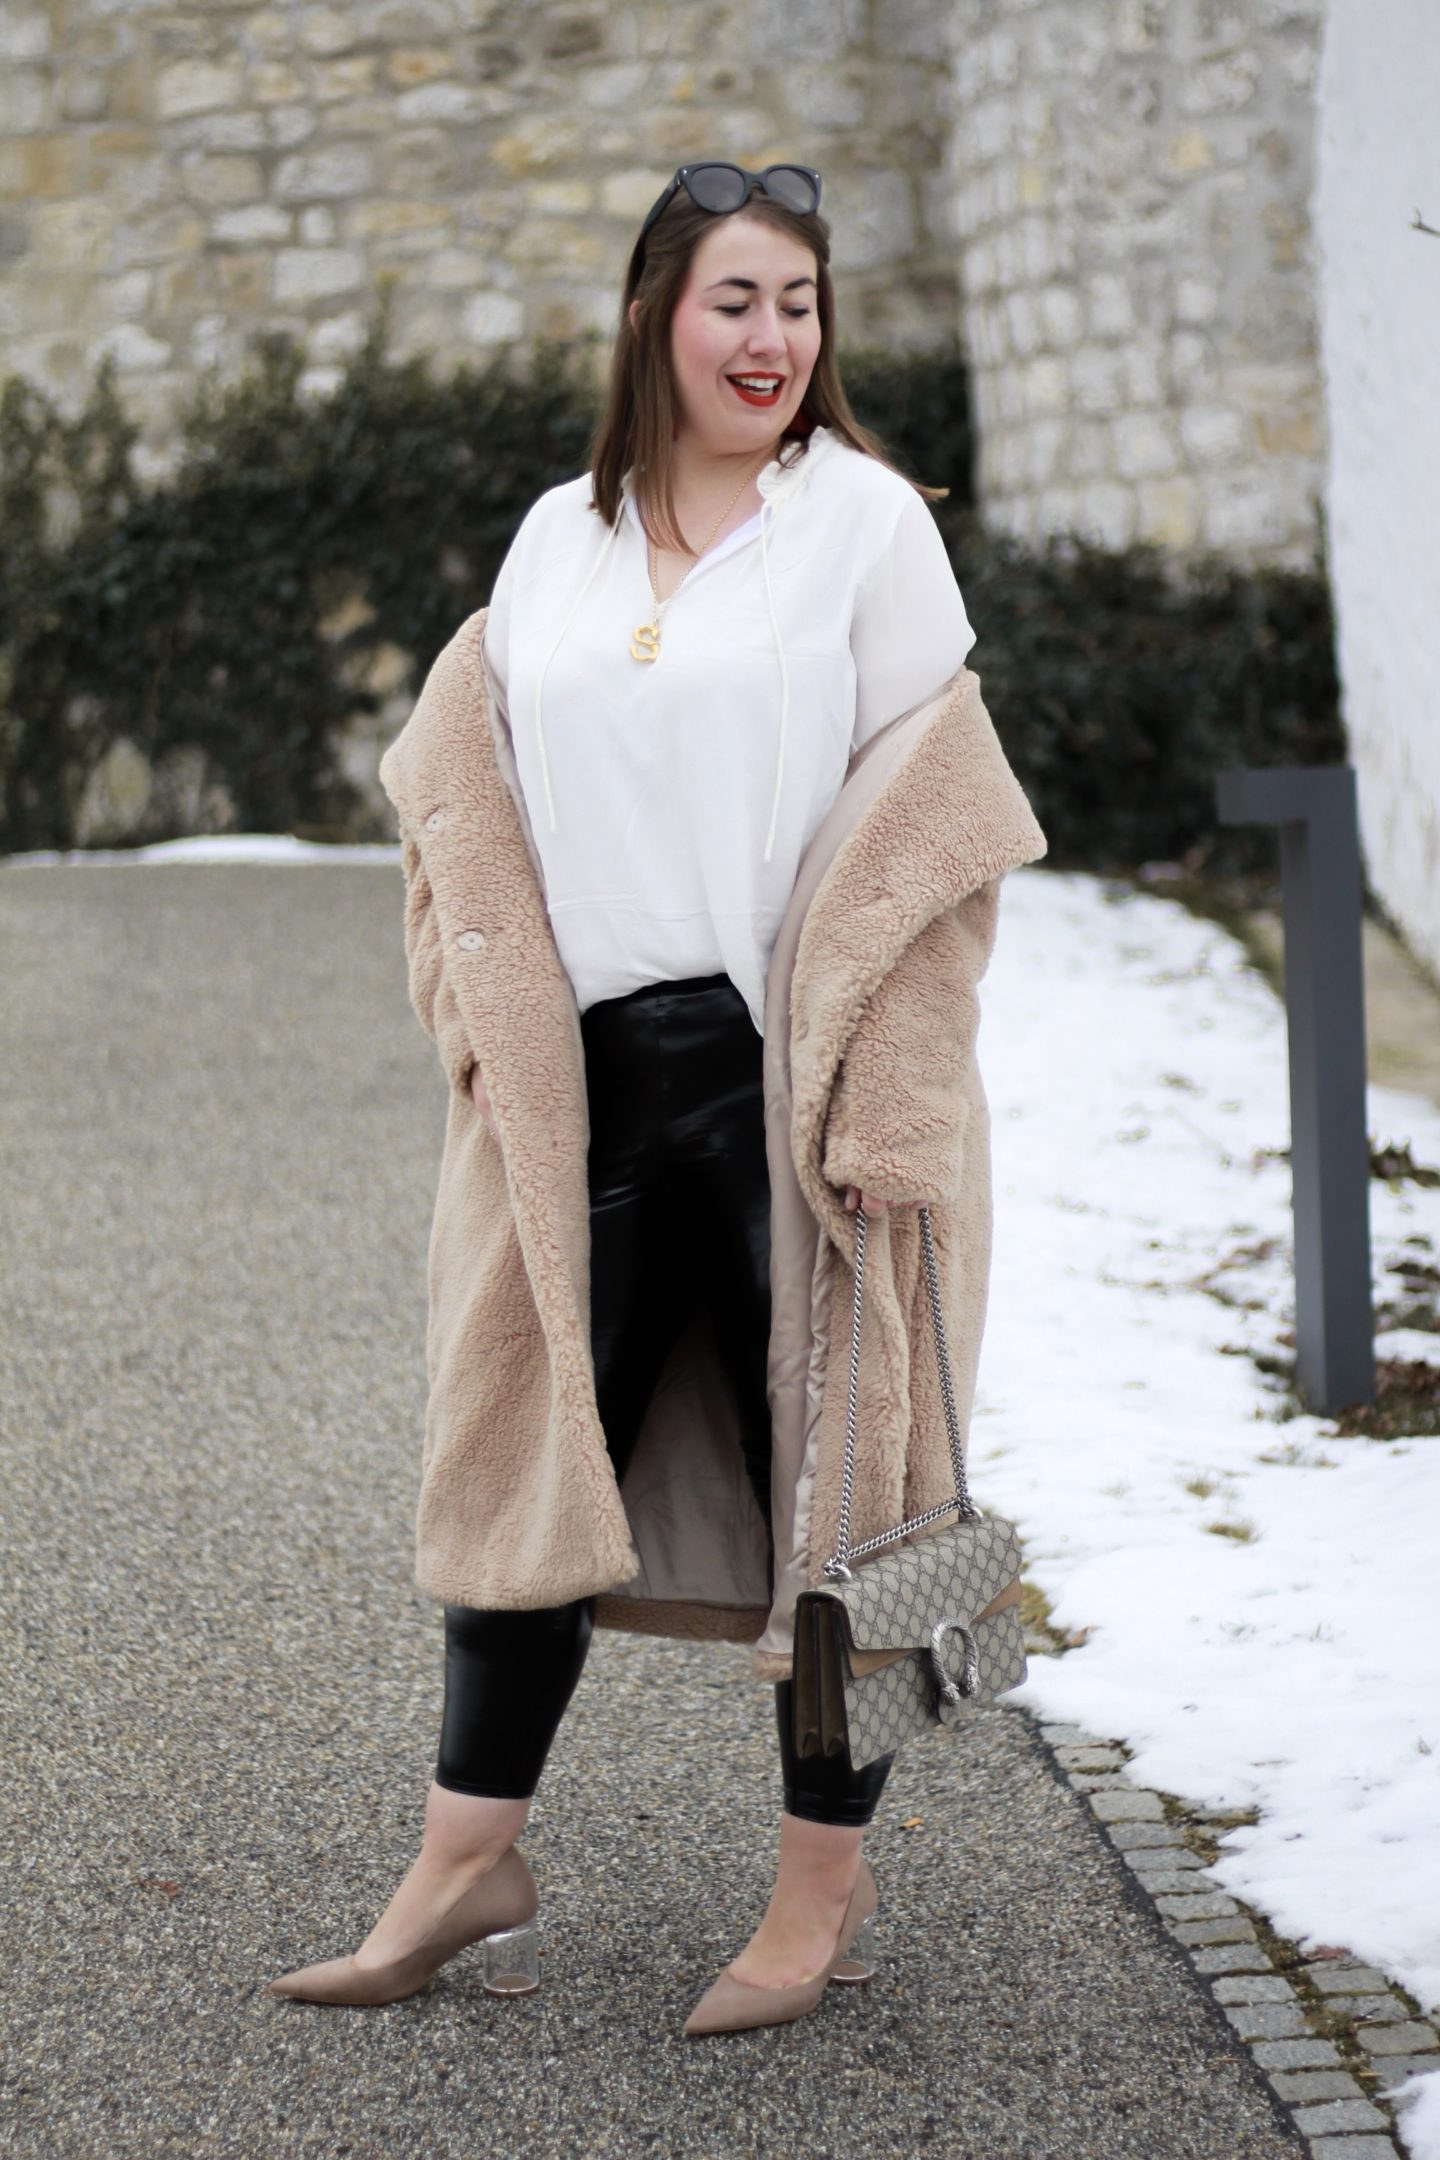 Streetstyle-Trend-Slumping-Teddycoat-Miss-Suzie-Loves-Gucci-Dionysus-Susanne-Heidebach